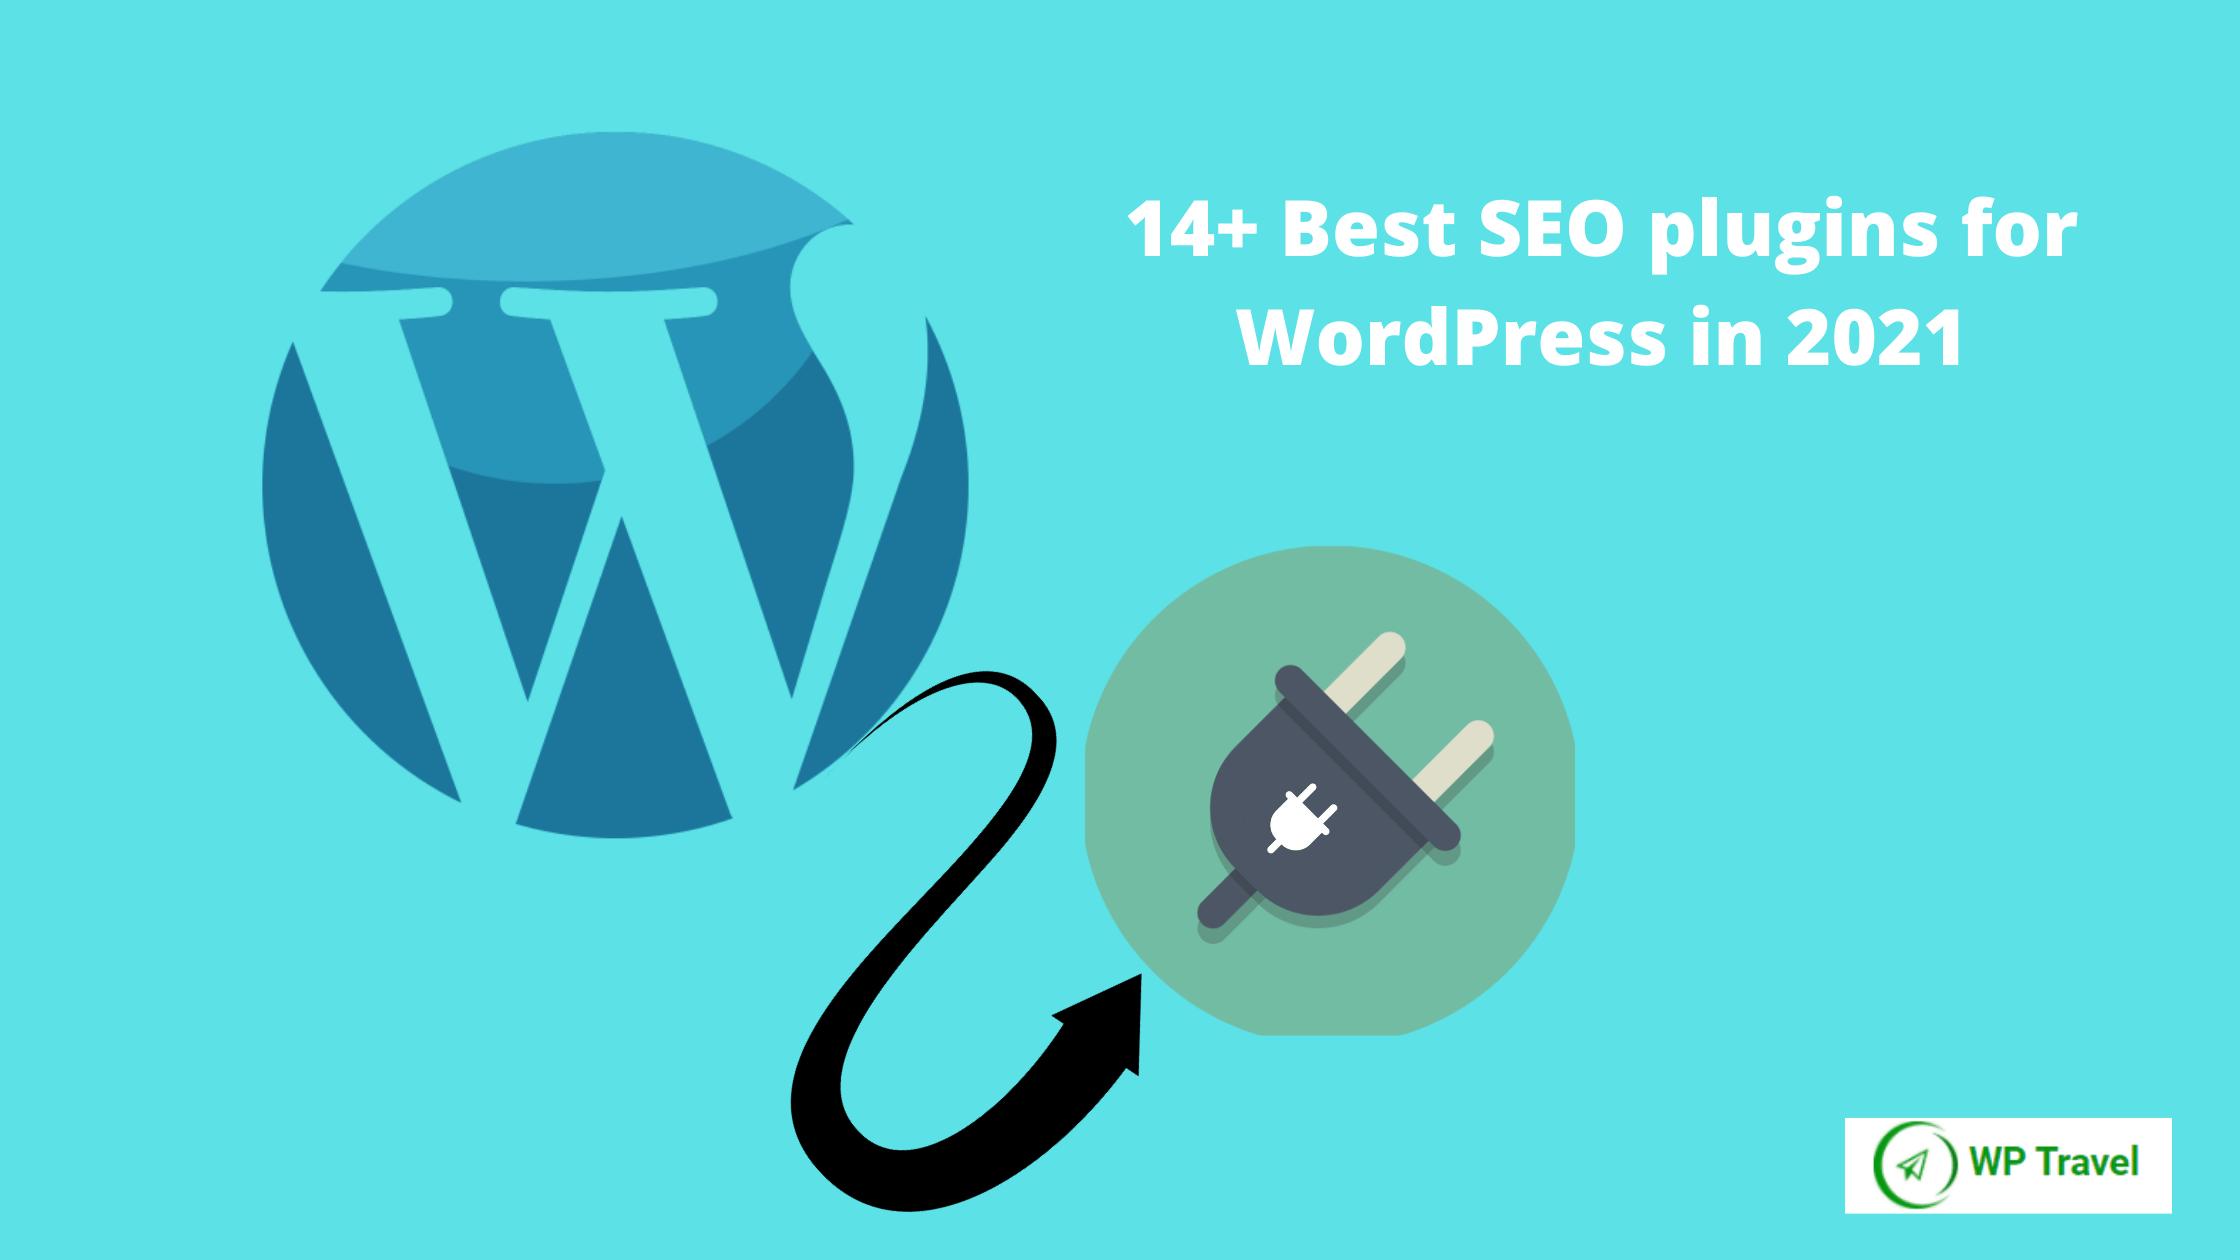 14+ Best SEO plugins for WordPress in 2021